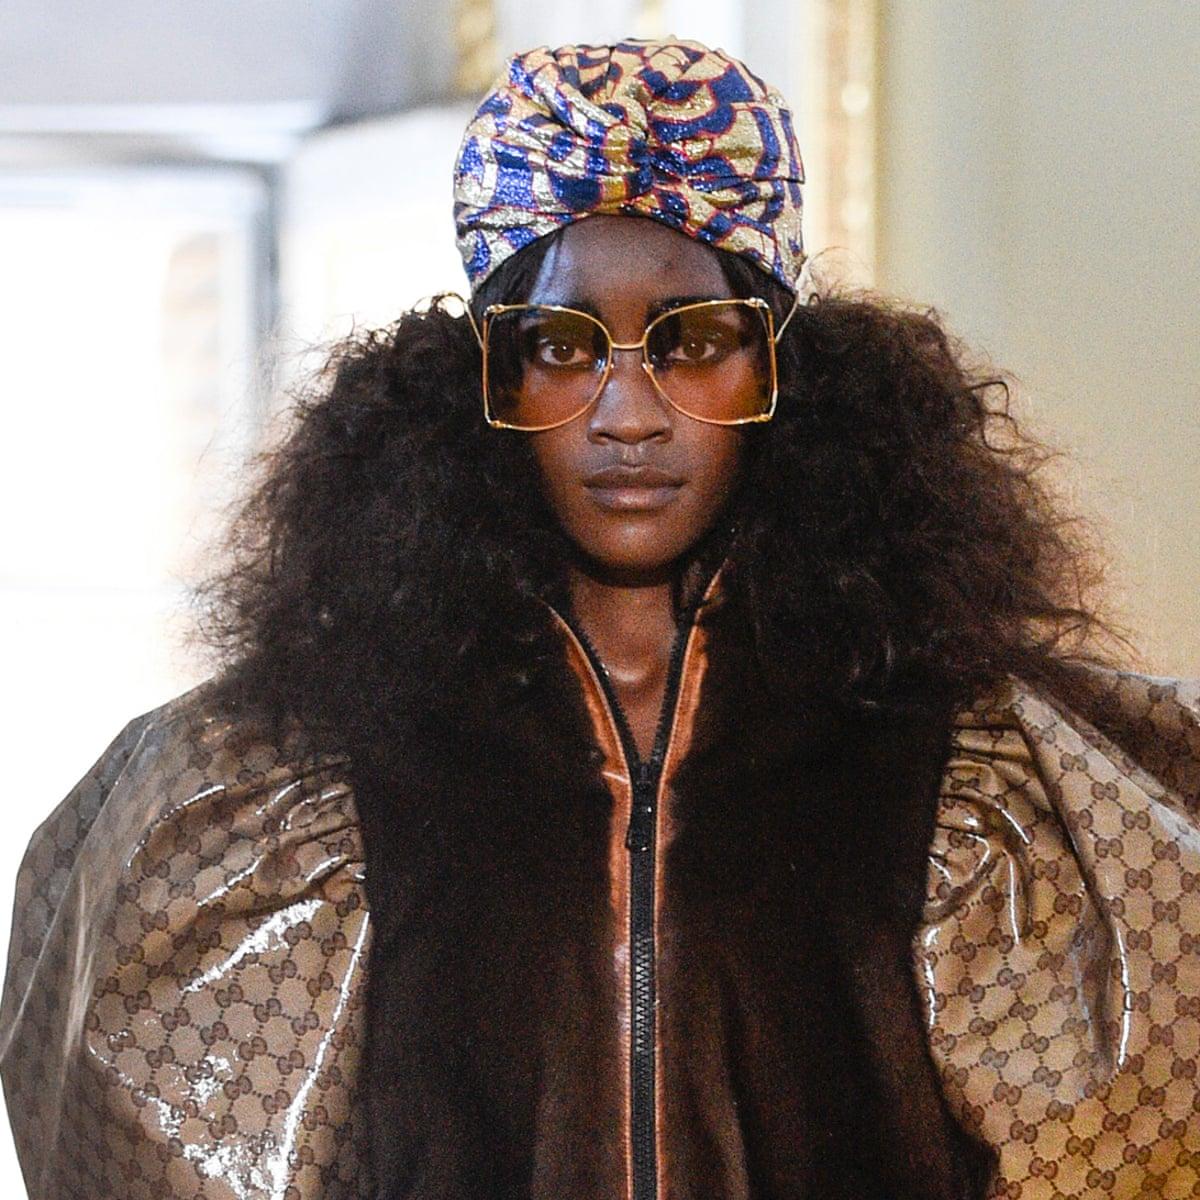 Homage Or Copy Why Fashion Especially Gucci Loves Dapper Dan Fashion The Guardian